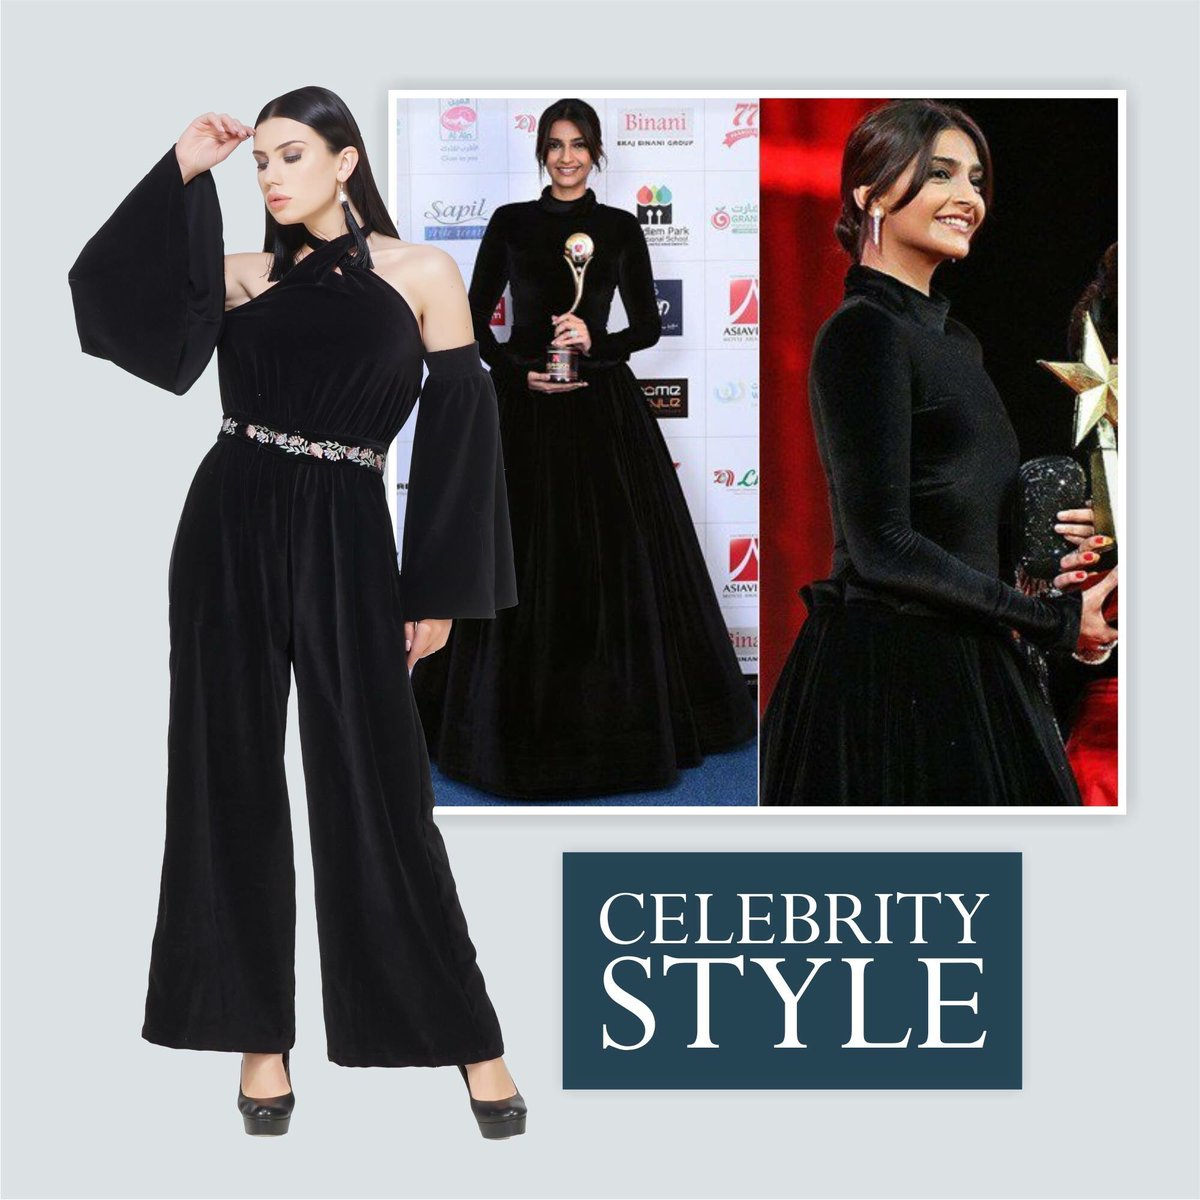 Dress like you are already famous! #CelebrityInspire at http://www.sexyandbroke.com  #Velvet #Black #Jumpsuit #Gown #BlackJumpsuit #SonamKapoor #CelebrityStyle #CelebrityFashion #OOTD #EmbroideredBelt #VelvetJumpsuit #SexyandBroke #OnlineShopping